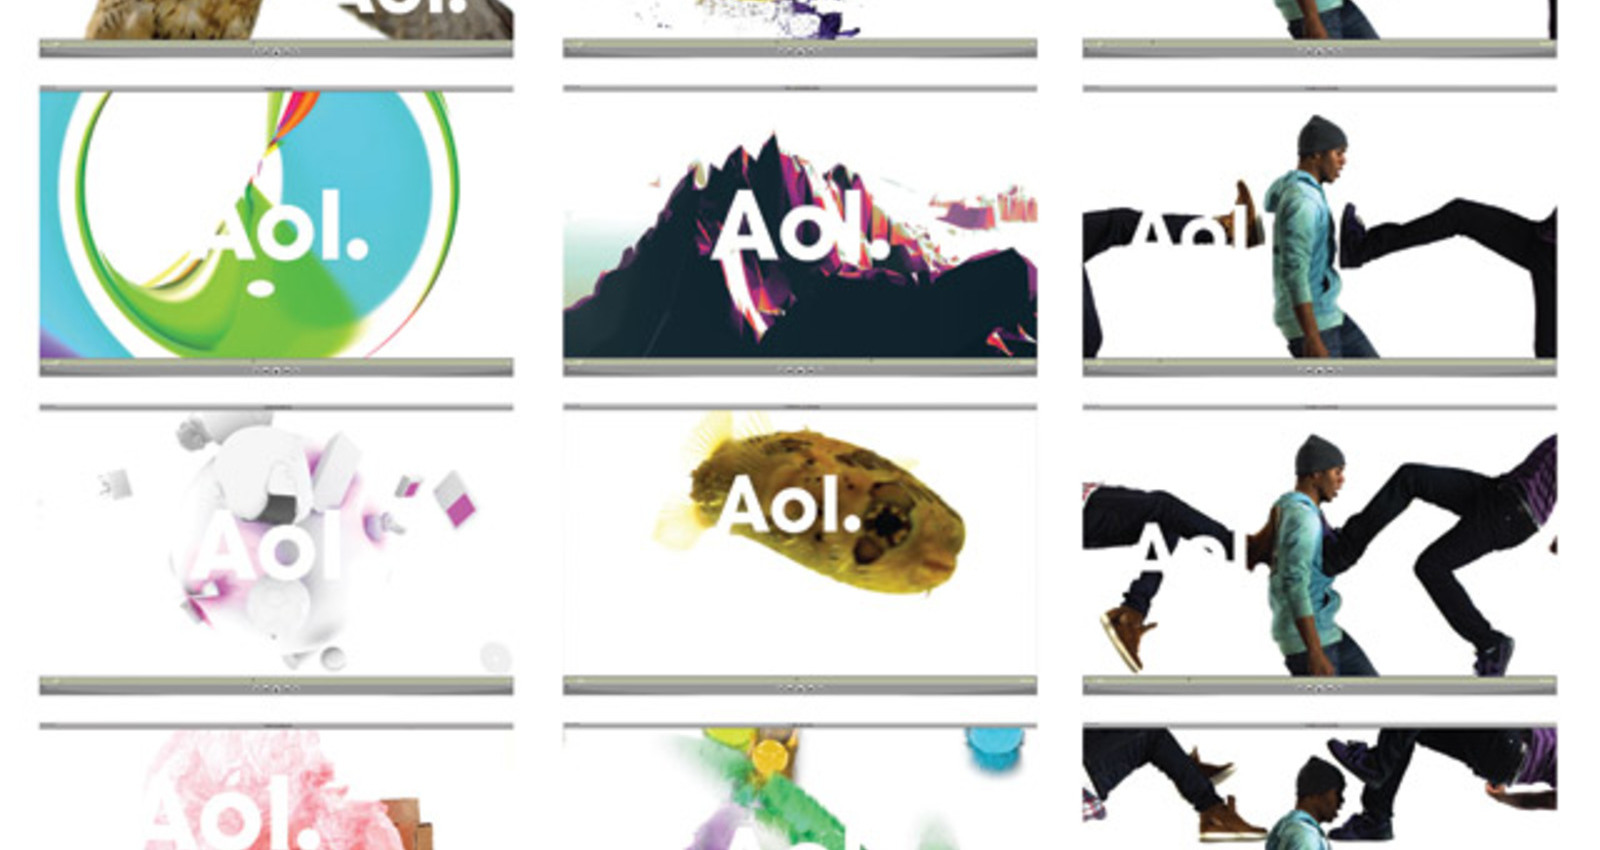 AOL Rebrand